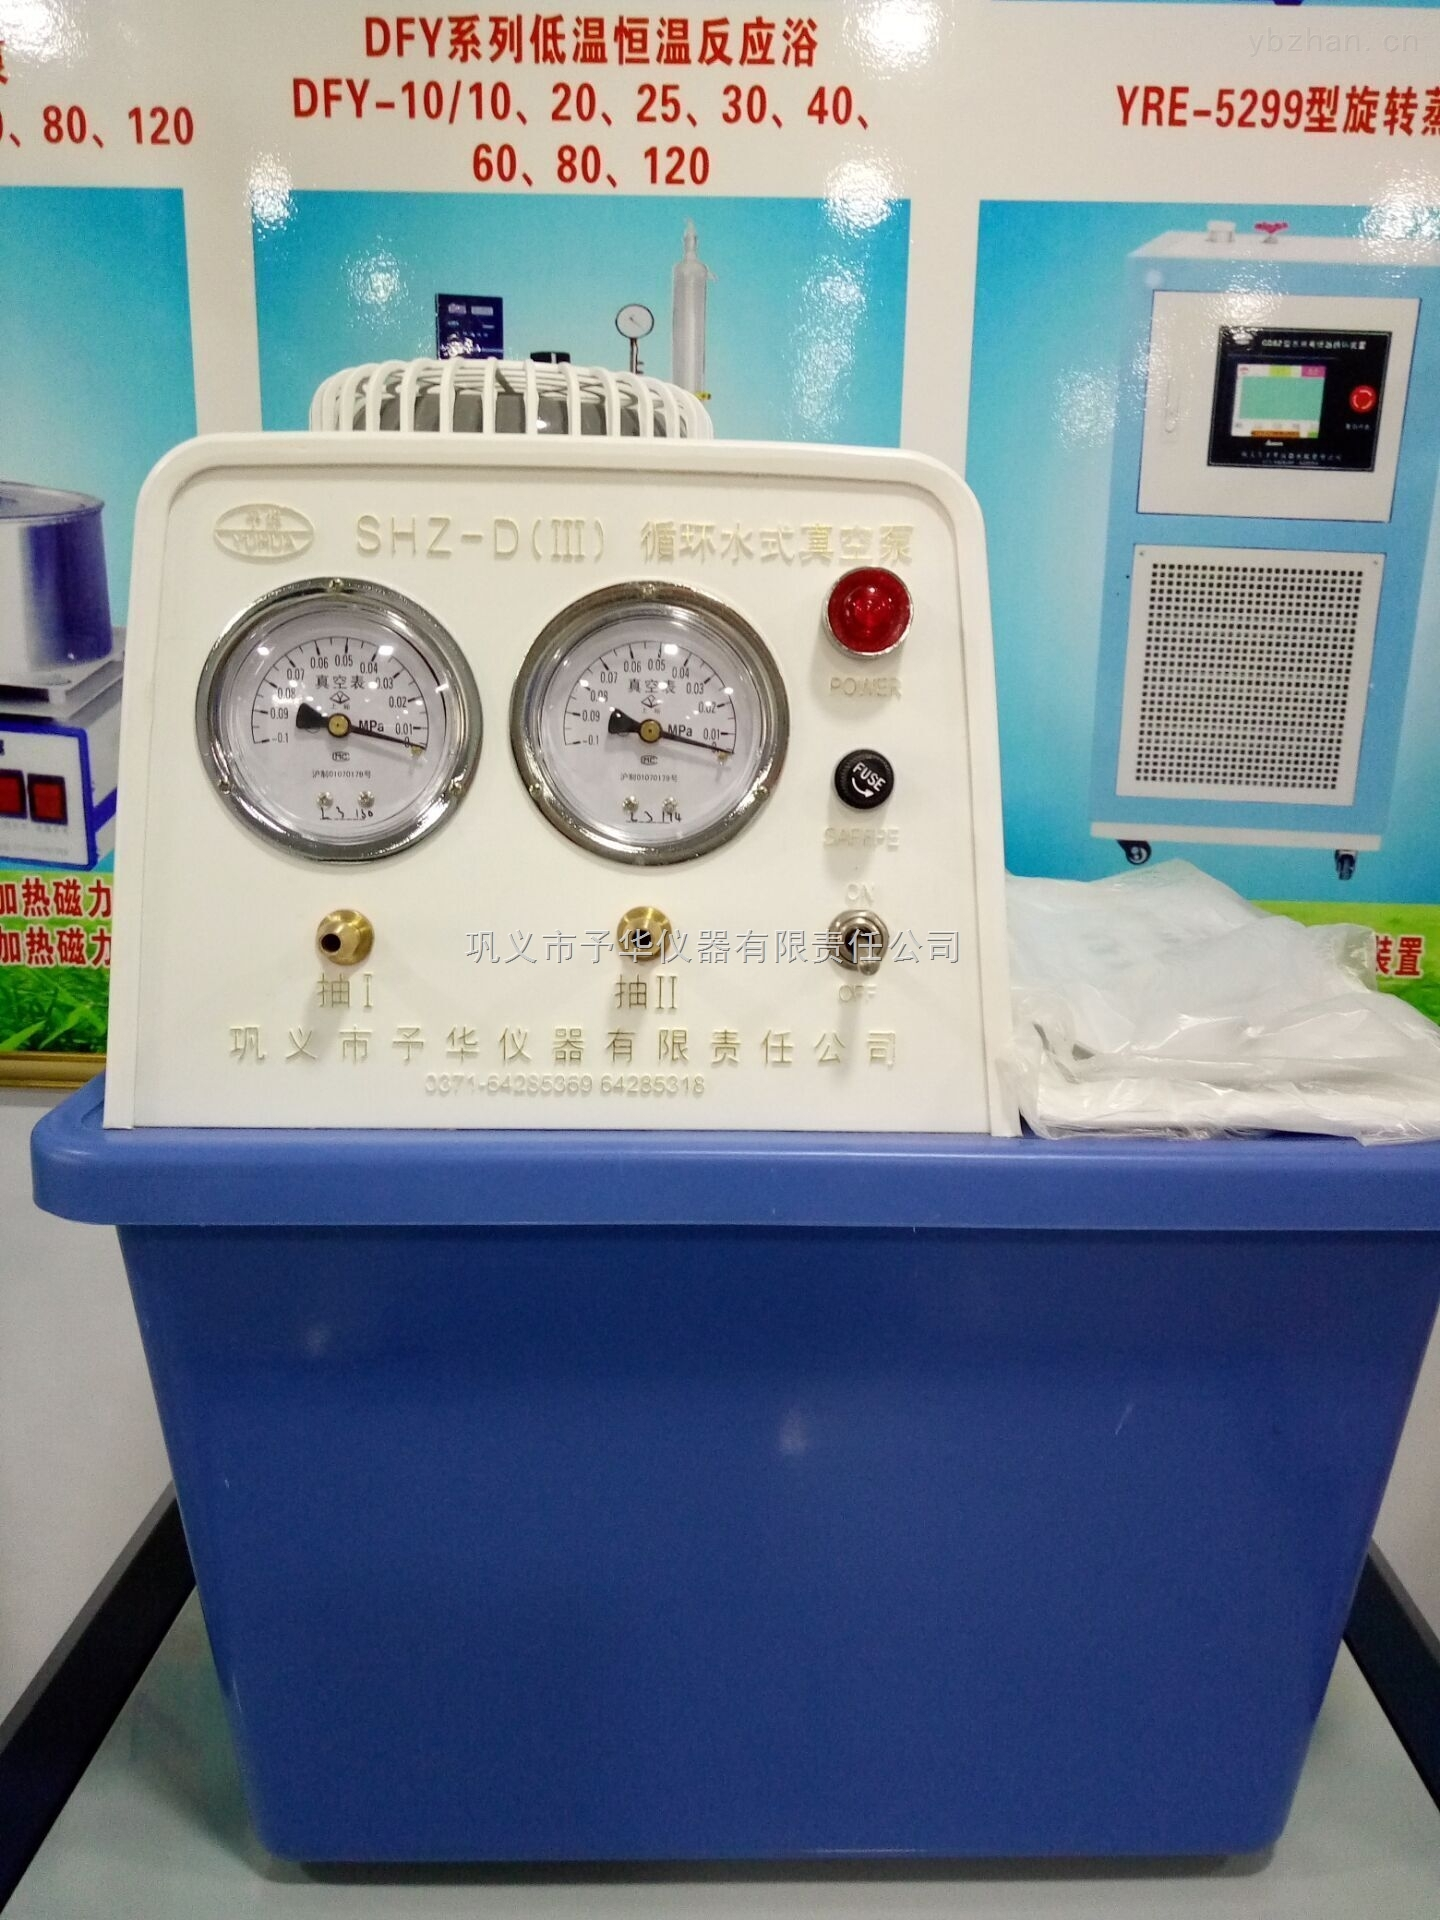 SHZ-D(Ⅲ)-臺式循環水多用真空泵予華儀器熱銷產品